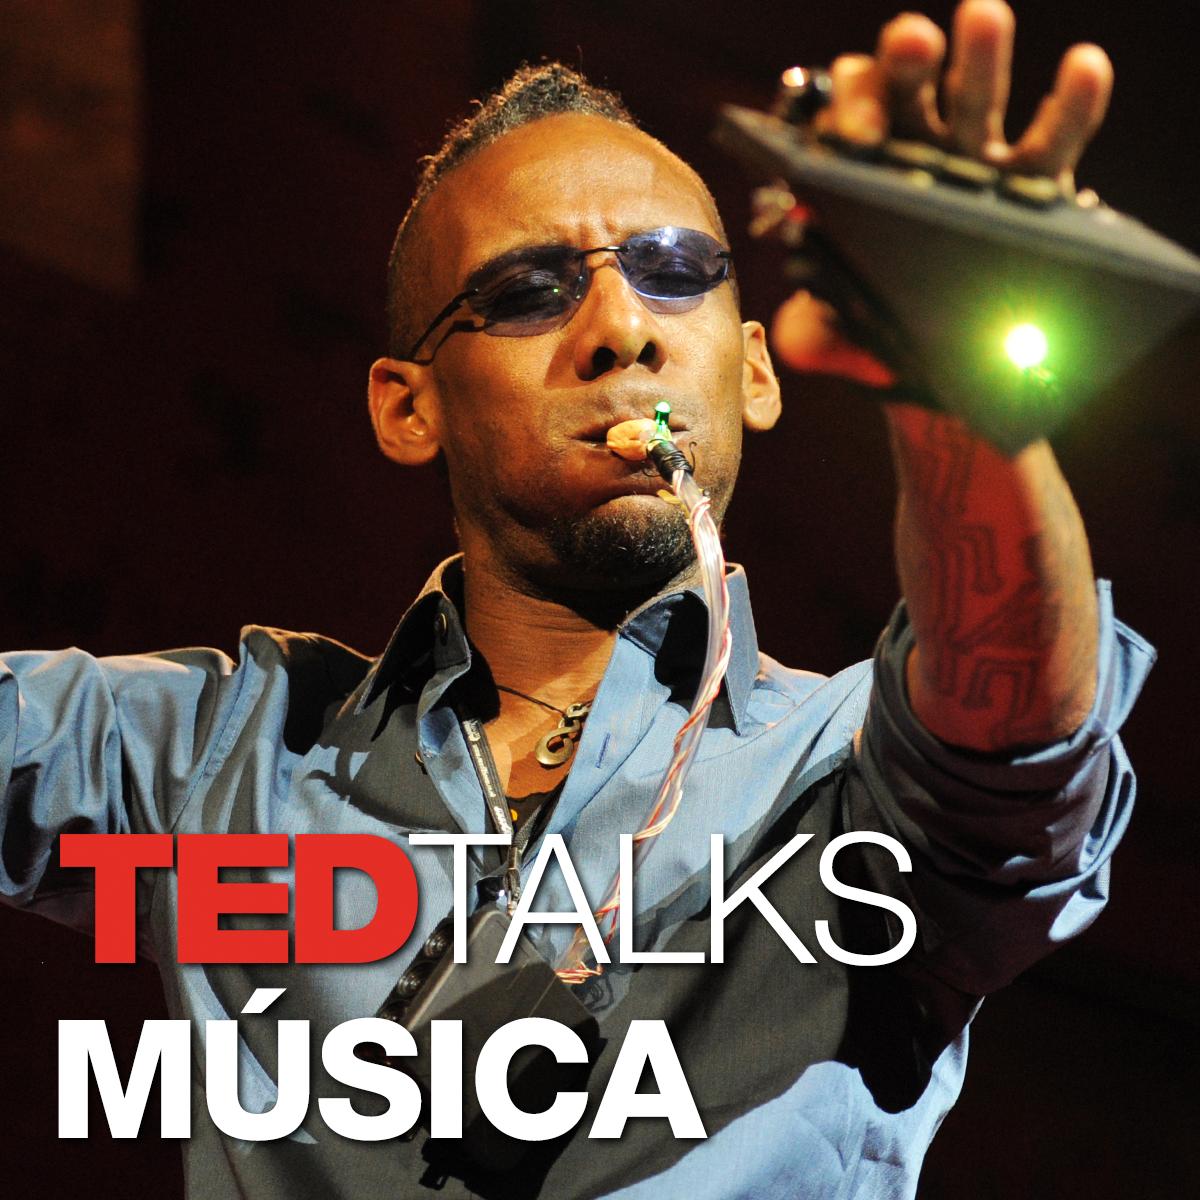 TEDTalks Música (Portuguese)